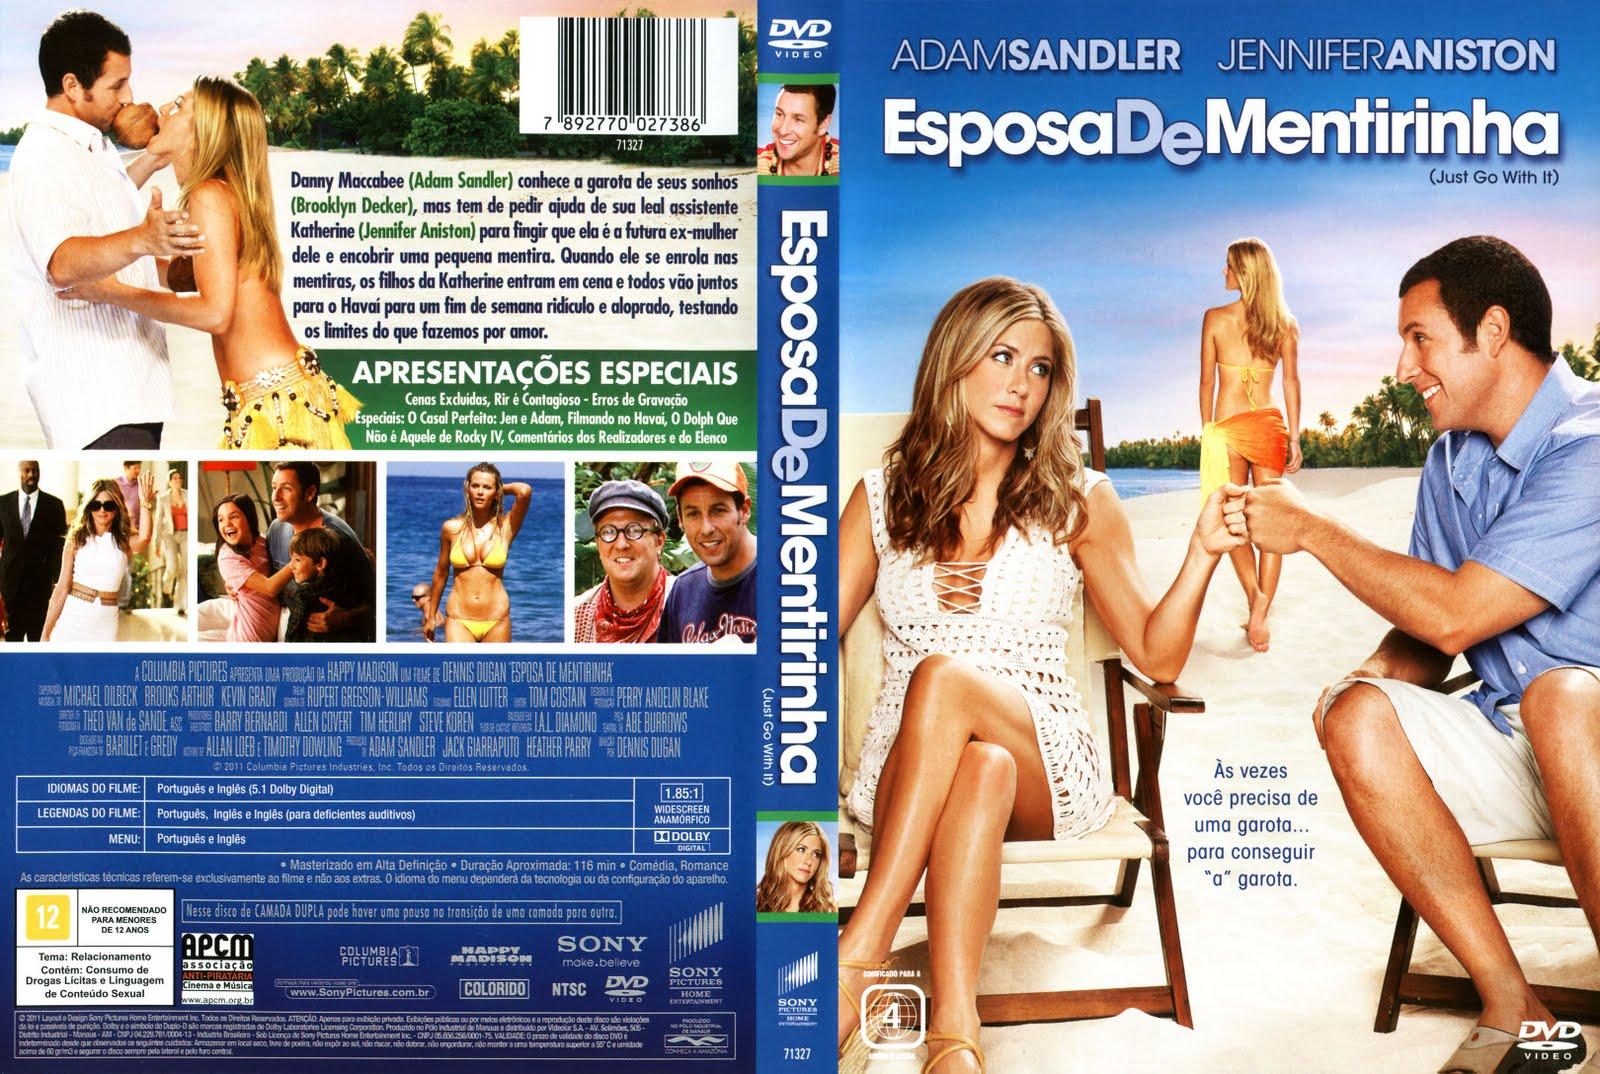 http://2.bp.blogspot.com/-p1REnucMKls/ThCC0902vsI/AAAAAAAAAHk/WK9JDsi6spk/s1600/ESPOSA+DE+MENTIRINHA.jpg